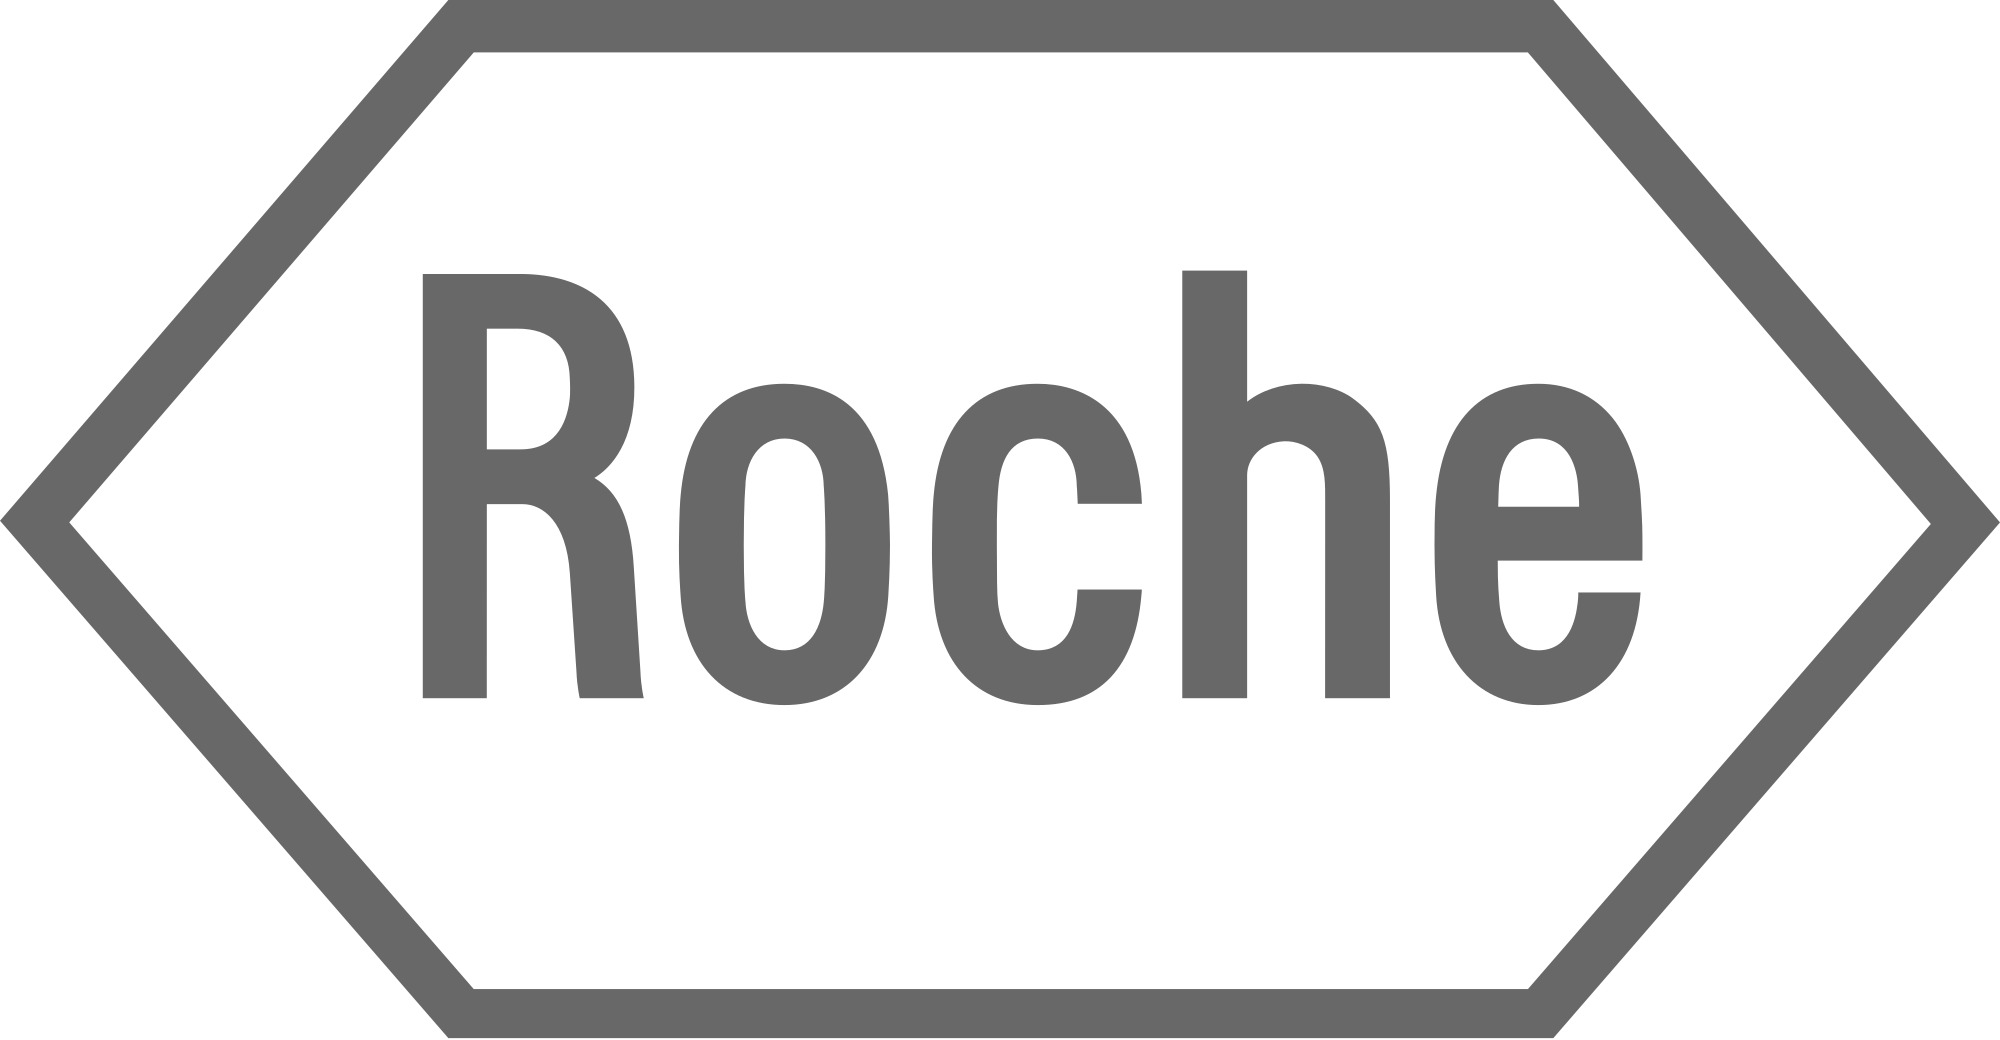 2000px-Hoffmann-La_Roche_logo.png